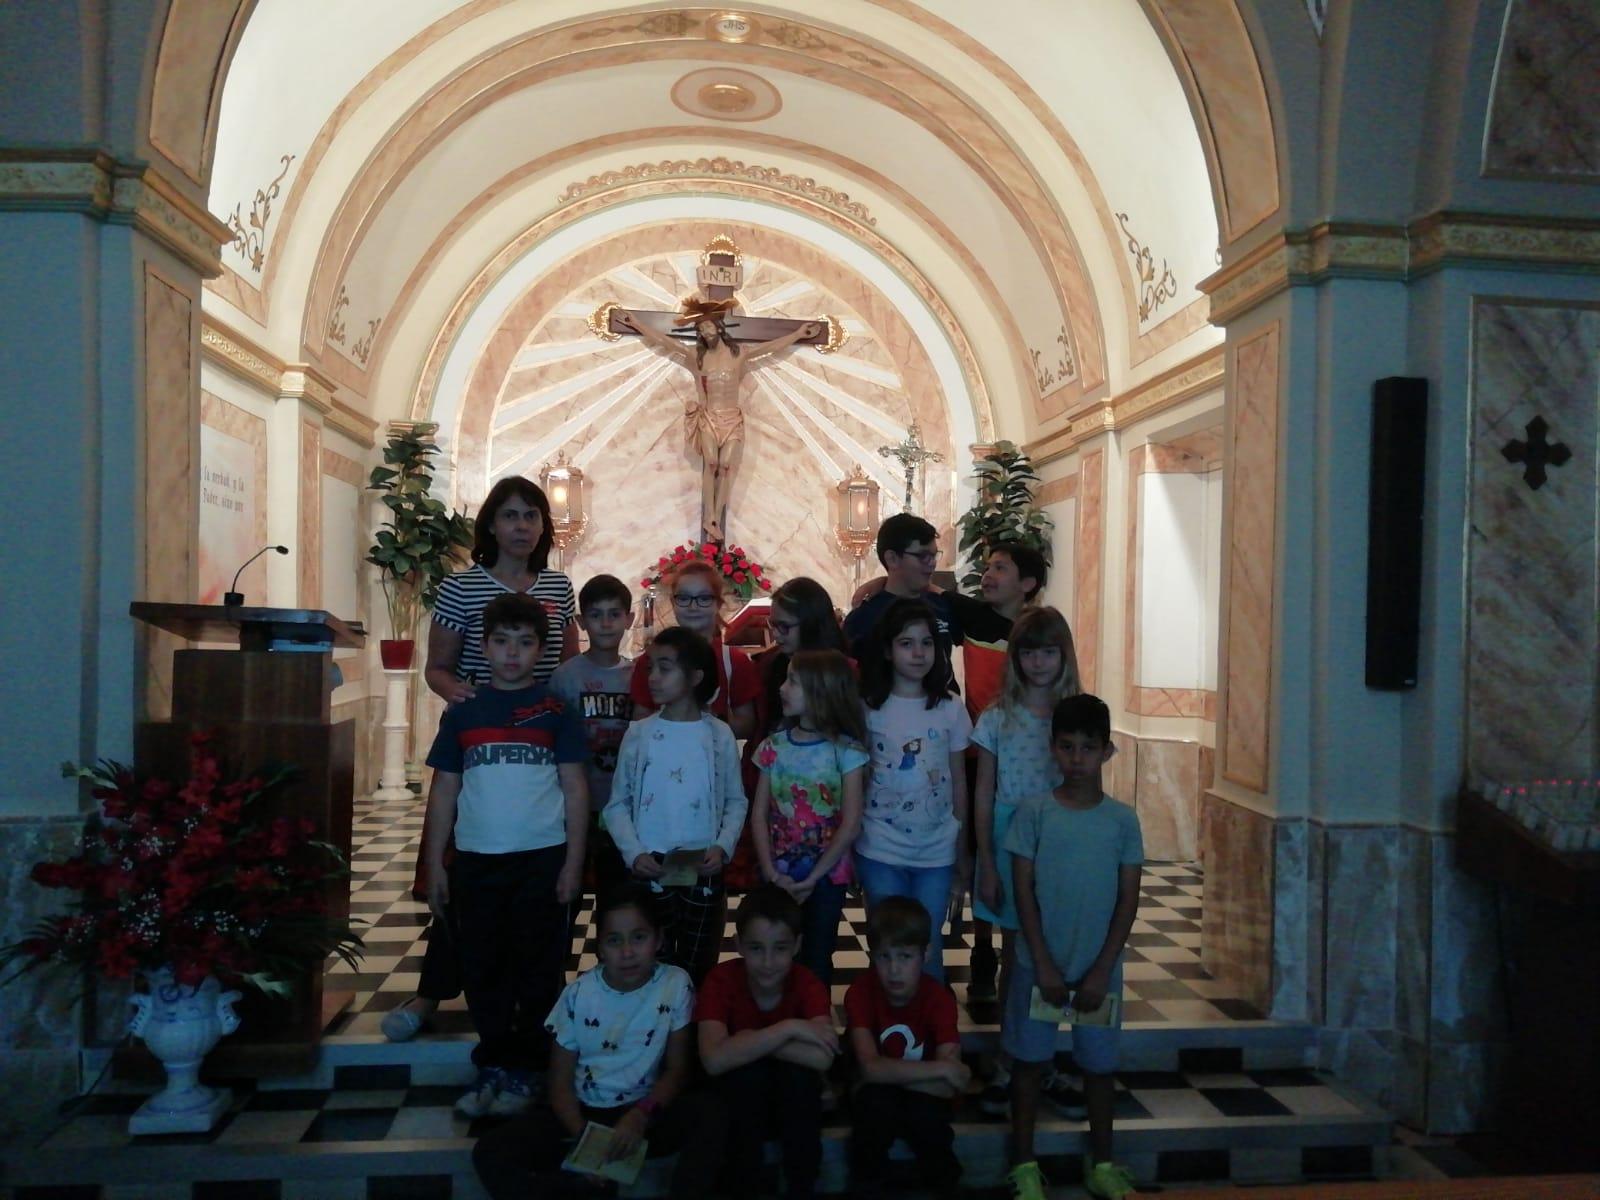 (2019-05-24) Visita ermita alumnos Laura - 3 A primaria - Reina Sofia - María Isabel Berenguer (03)